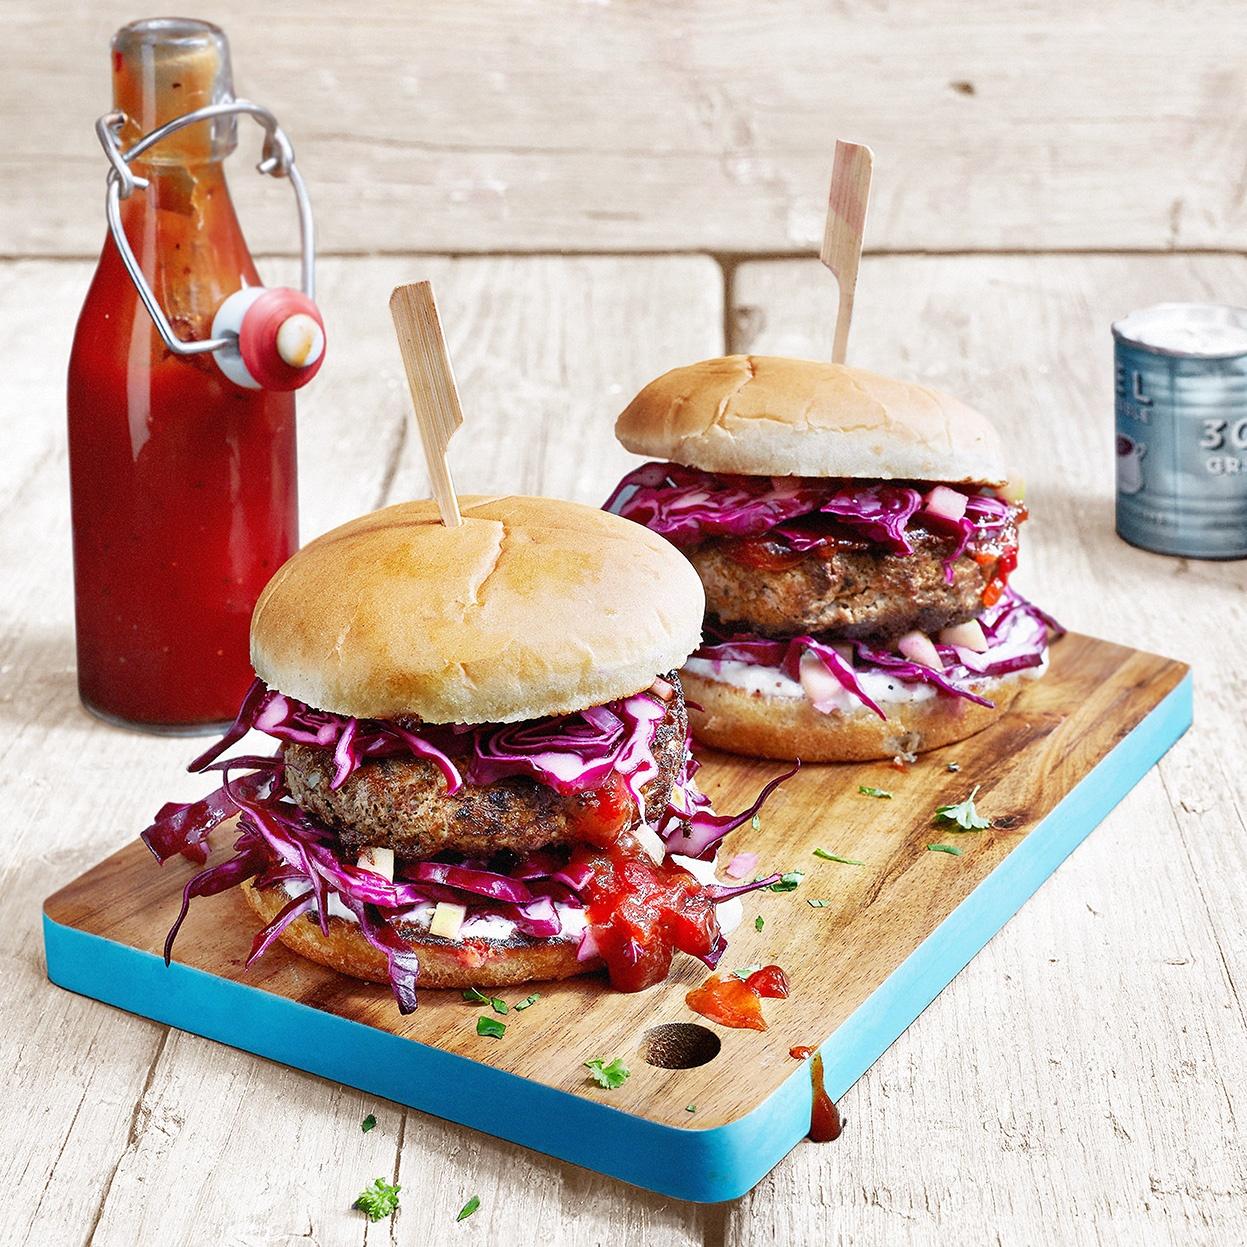 Rotkohl-Burger